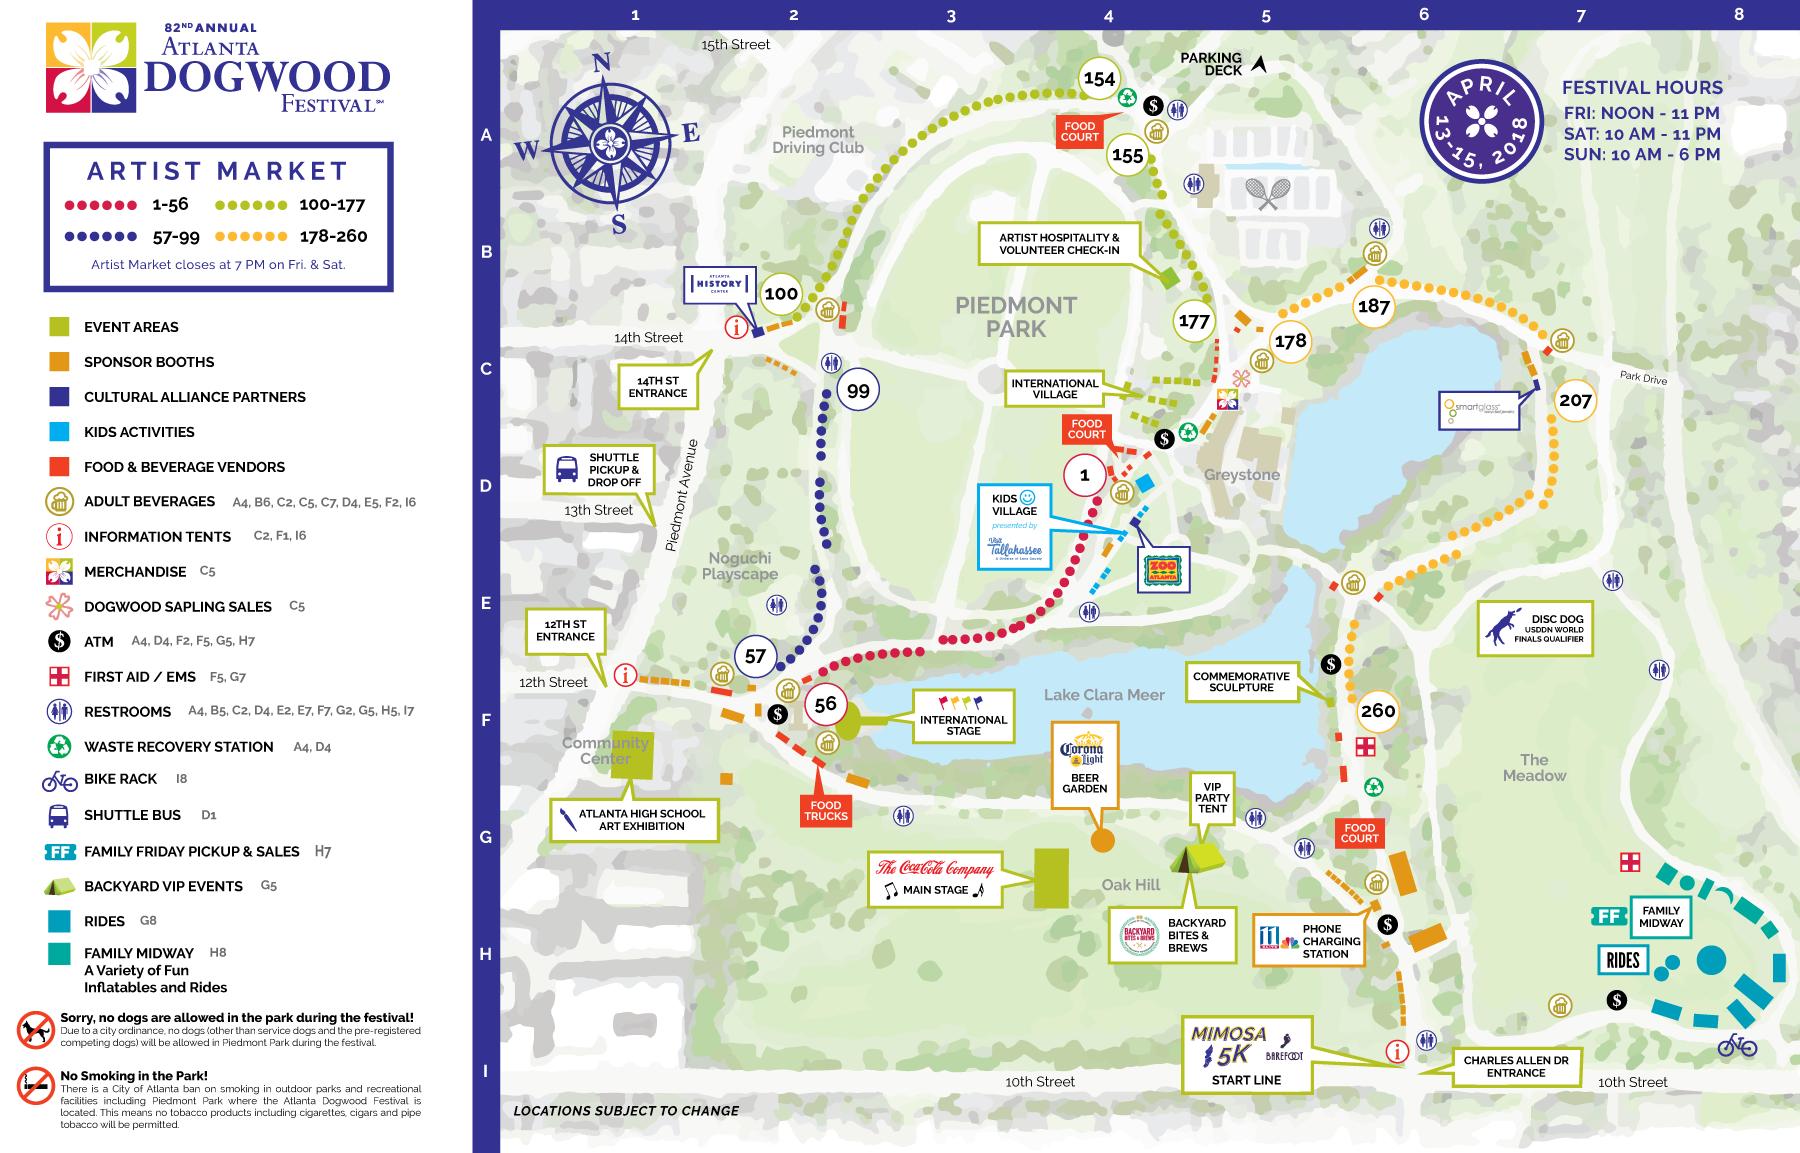 Atlanta Dogwood Festival Festival Map